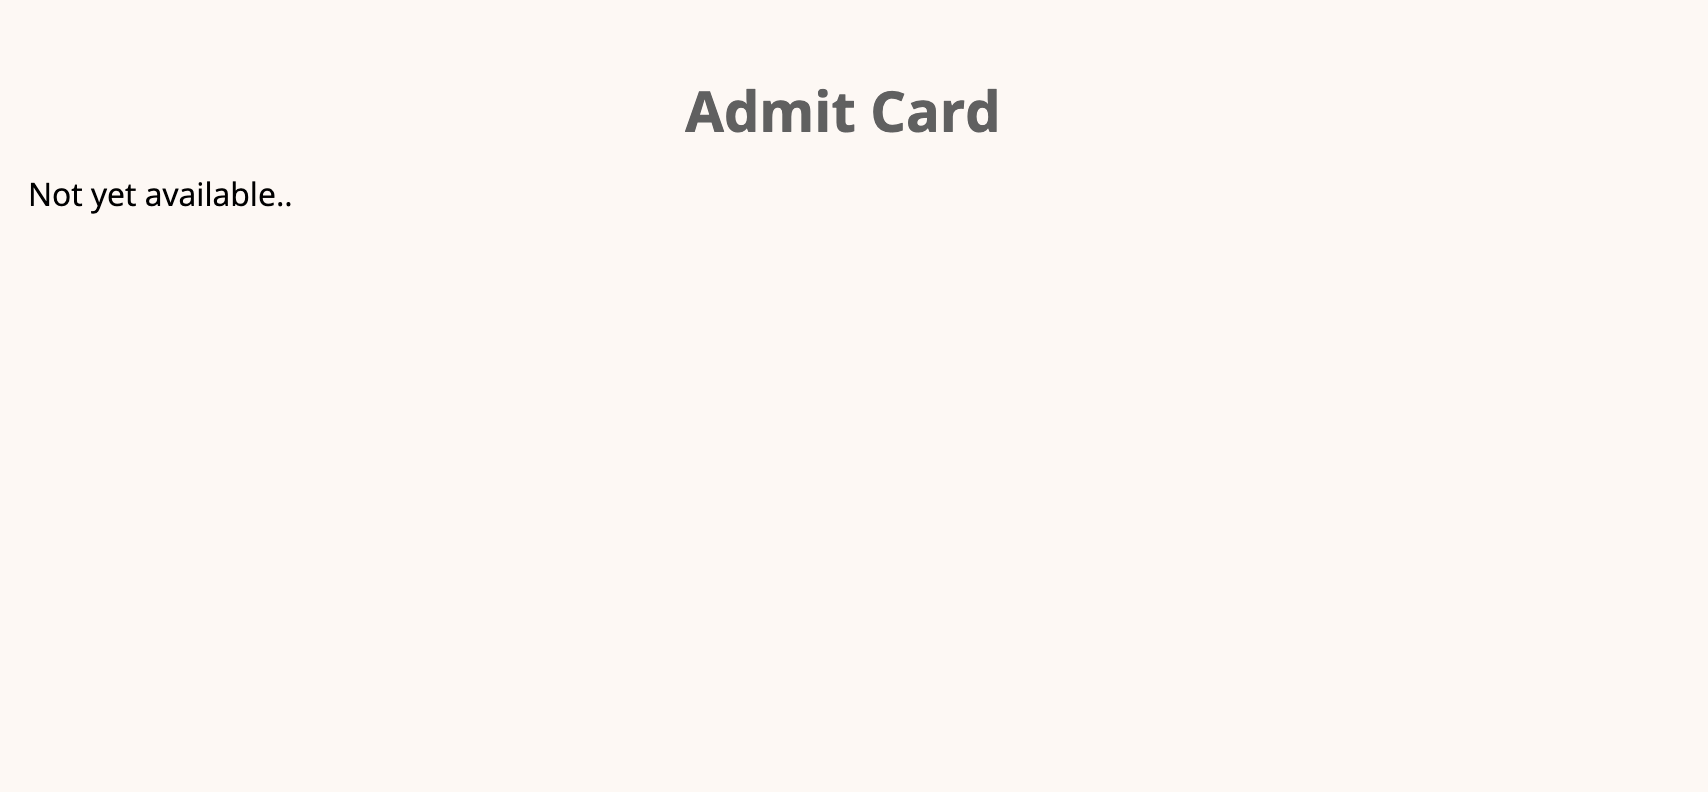 jee advanced admit card, jee advanced 2021 admit card, jee advanced admit card 2021, jeeadv.ac.in admit card 2021, jeeadv.nic.in 2021, jee advanced official website, jeeadv ac in, jee.adv.nic, www.jeeadv.ac.in 2021, jeeadv. nta. nic. in, jee advance 2021, jee adv, jee adv admit card, jee advanced admit card 2021, jee advanced 2021, jee admit card 2021